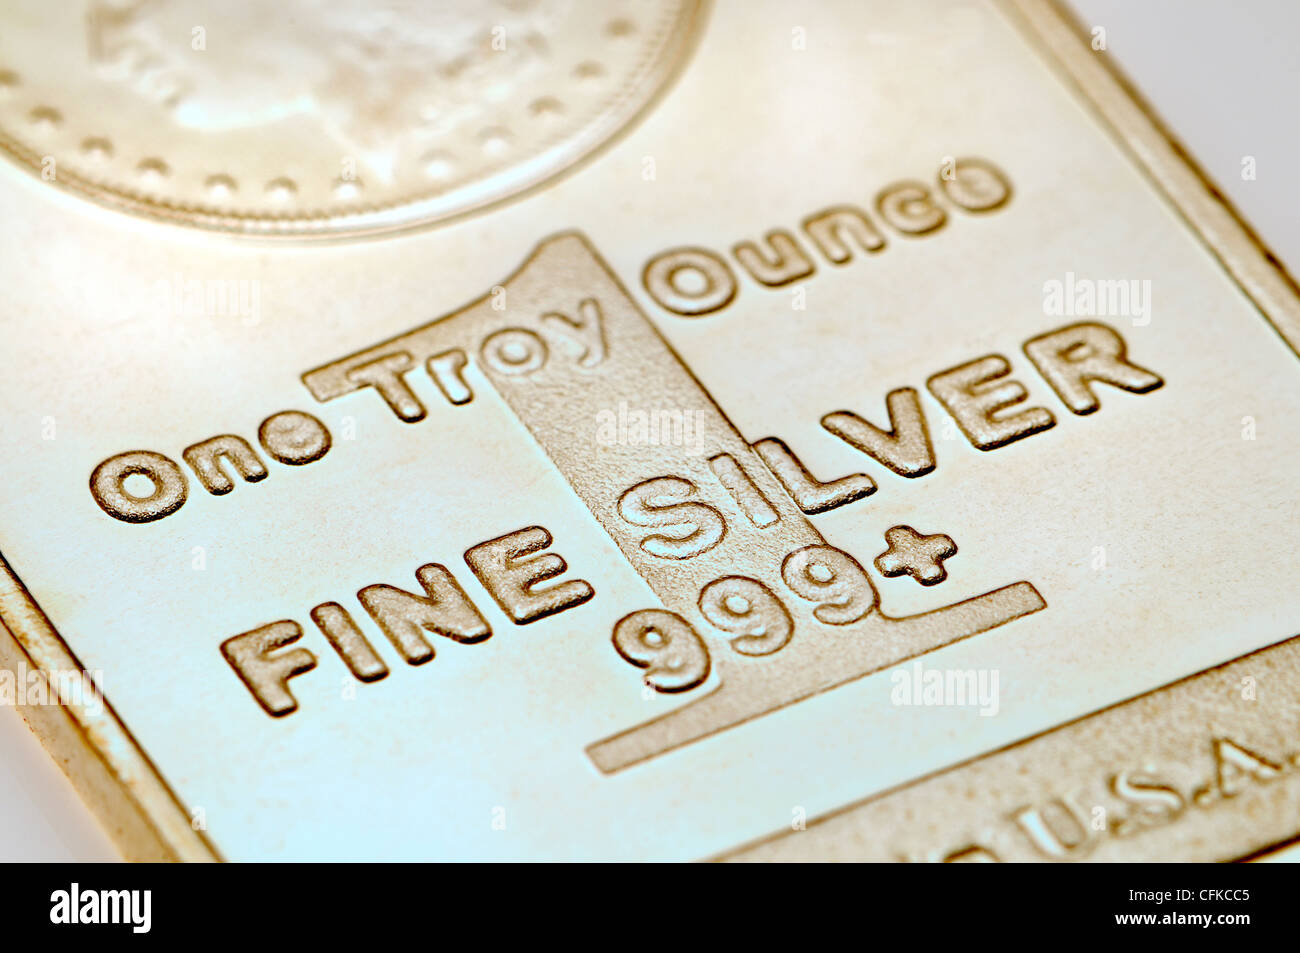 Silver bullion ingot - one troy ounce - Stock Image